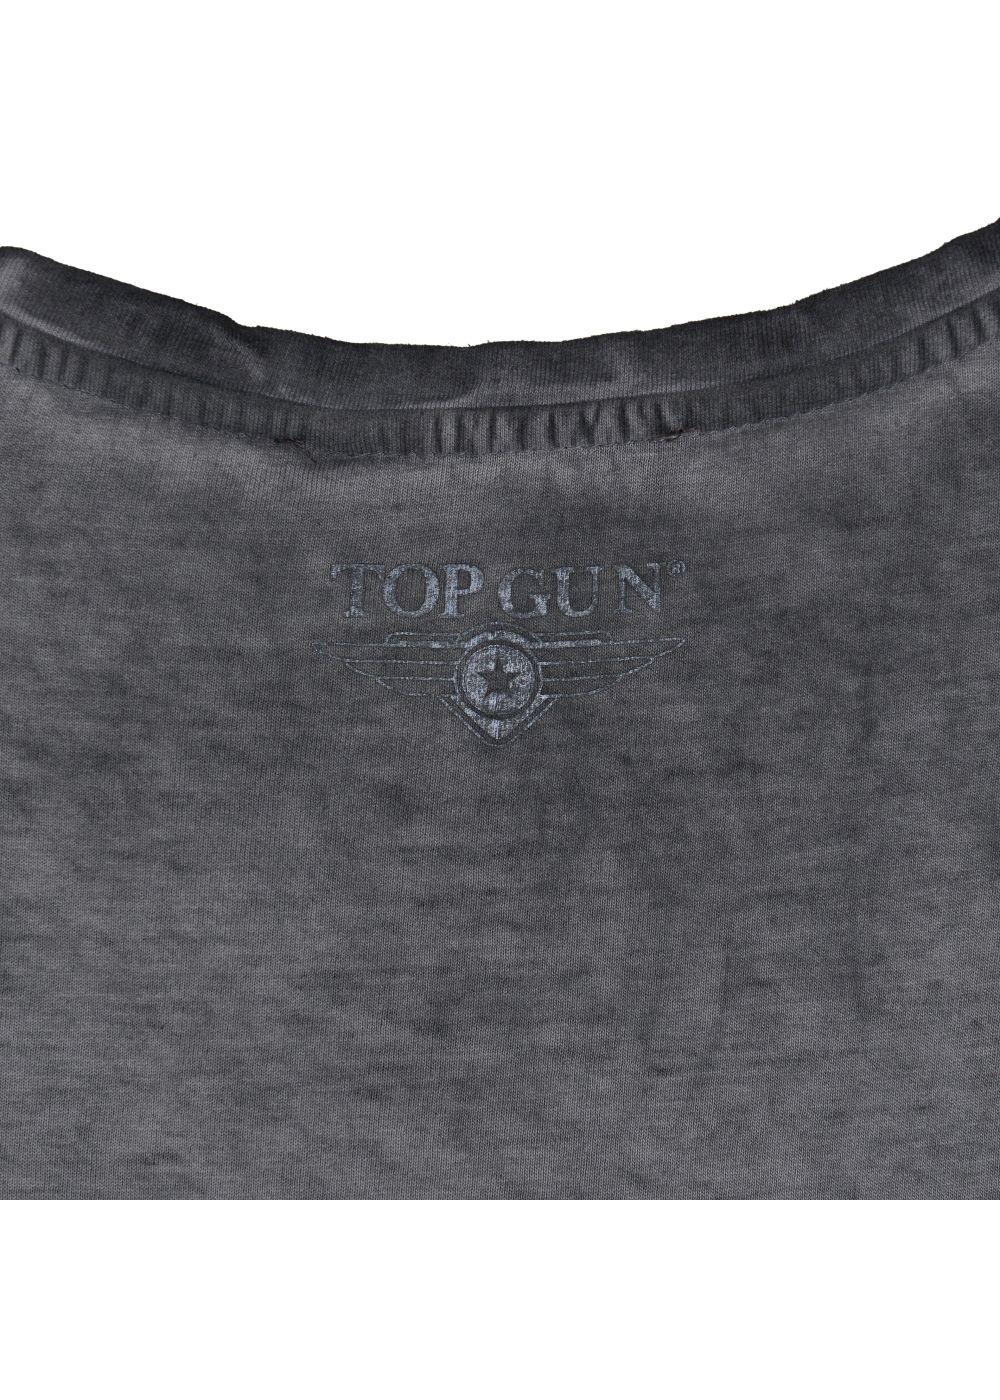 T-shirt męski TSHMT-0053-91(Z20)